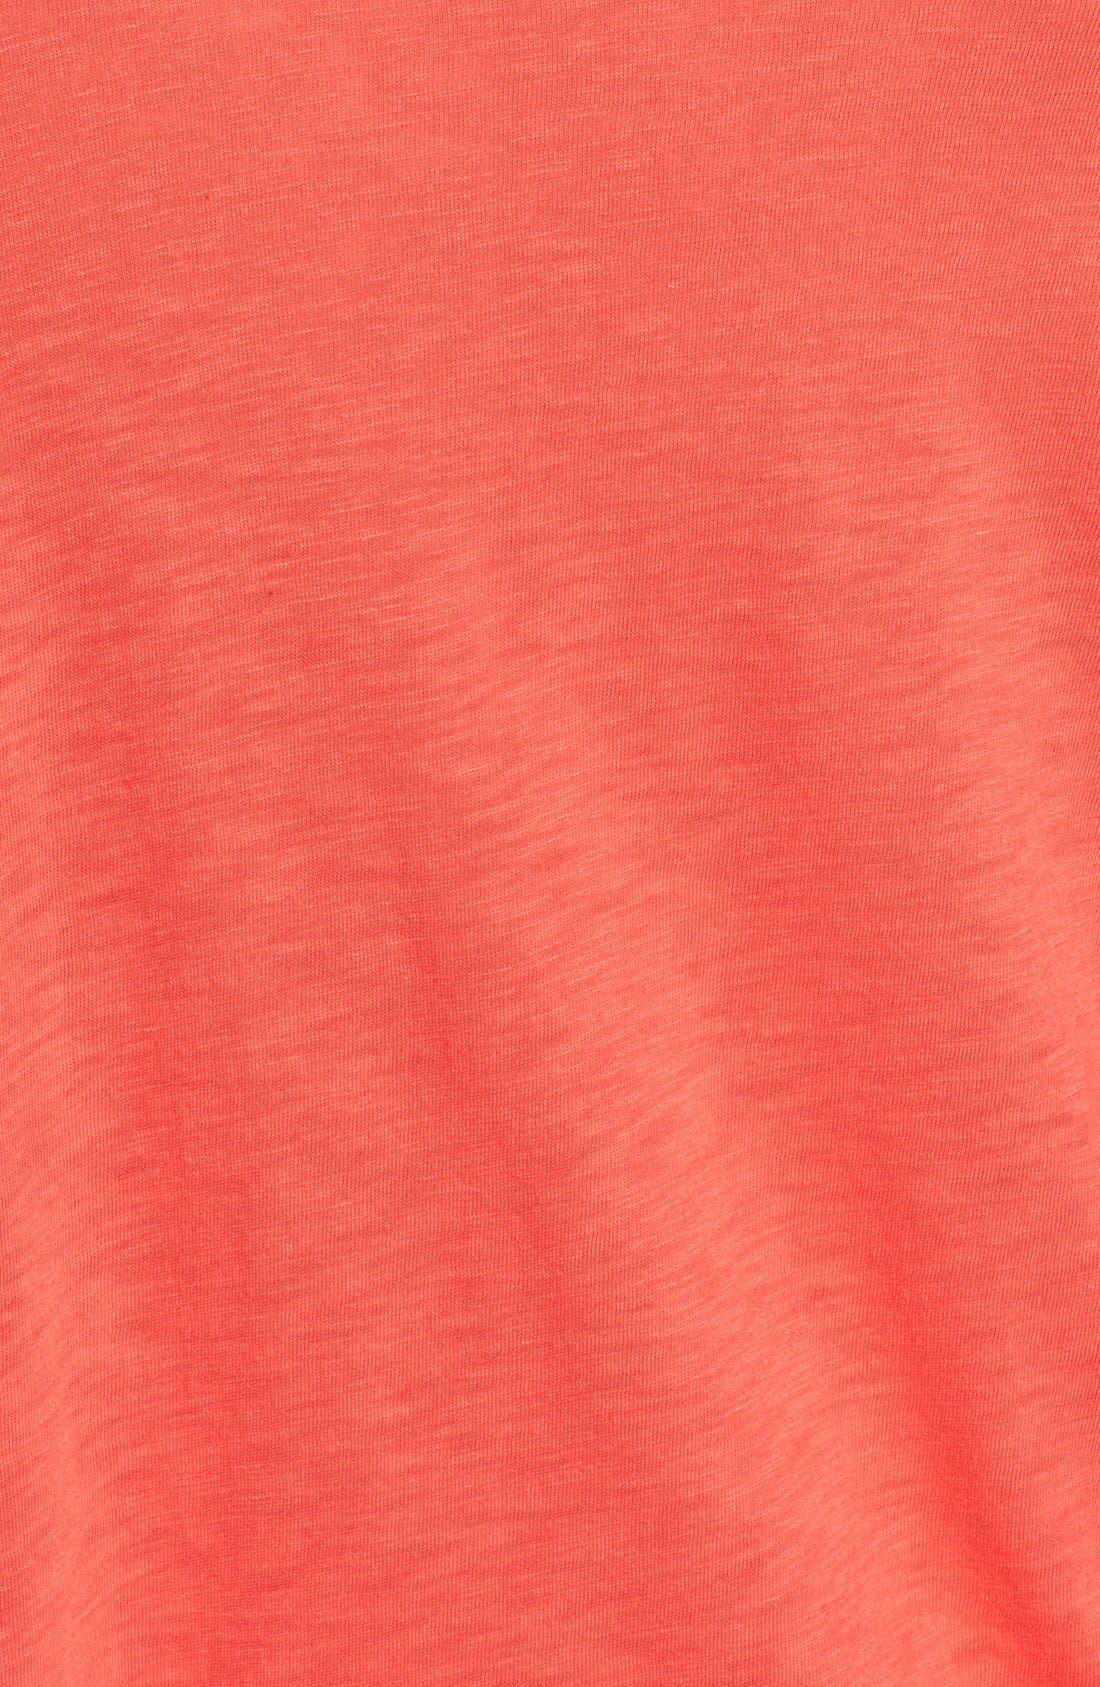 Alternate Image 3  - Splendid Slub Knit Cotton Blend Top